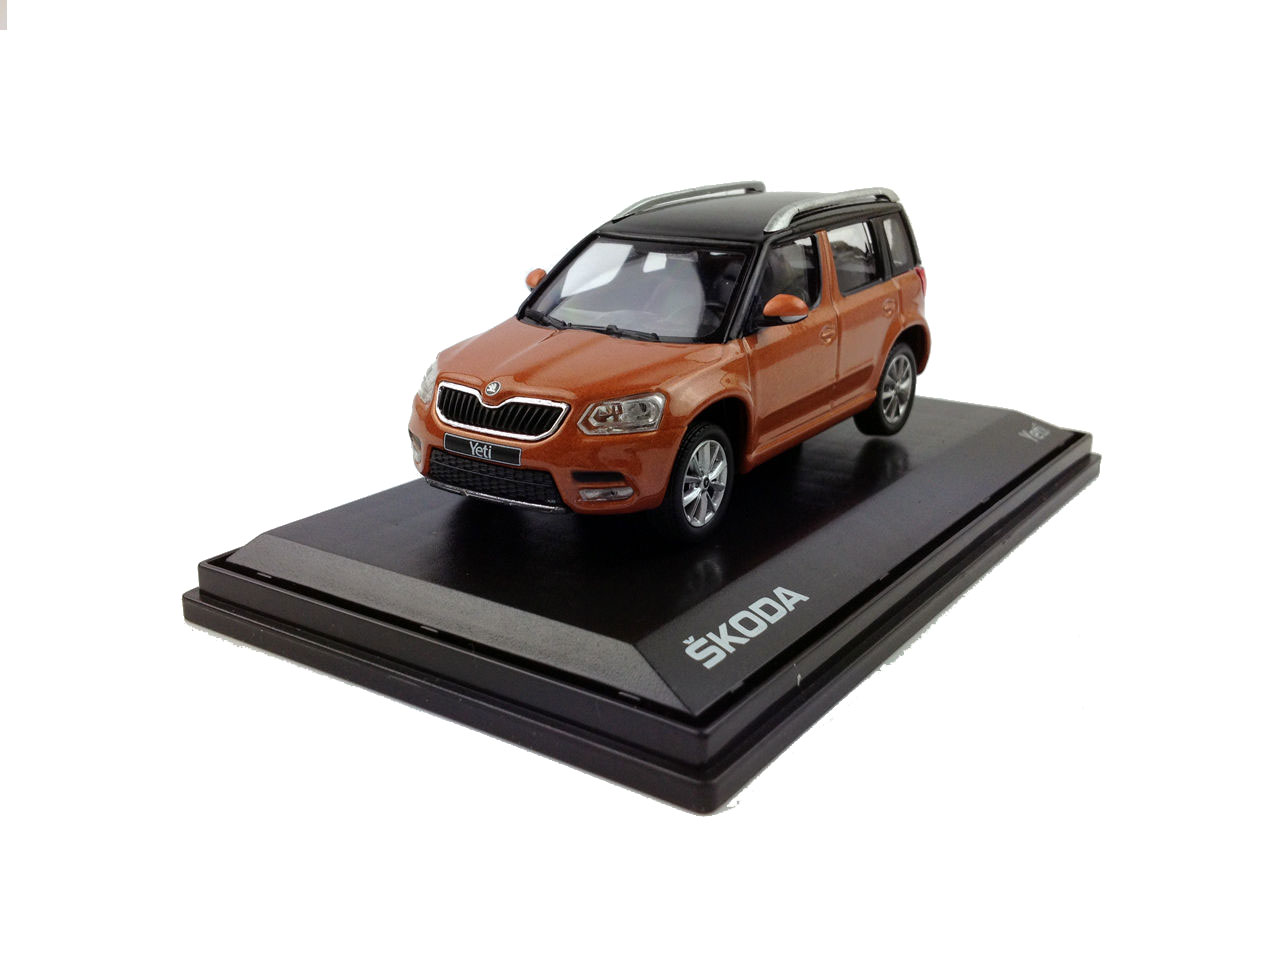 Skoda Yeti 1/43 Scale Diecast Model Car 6